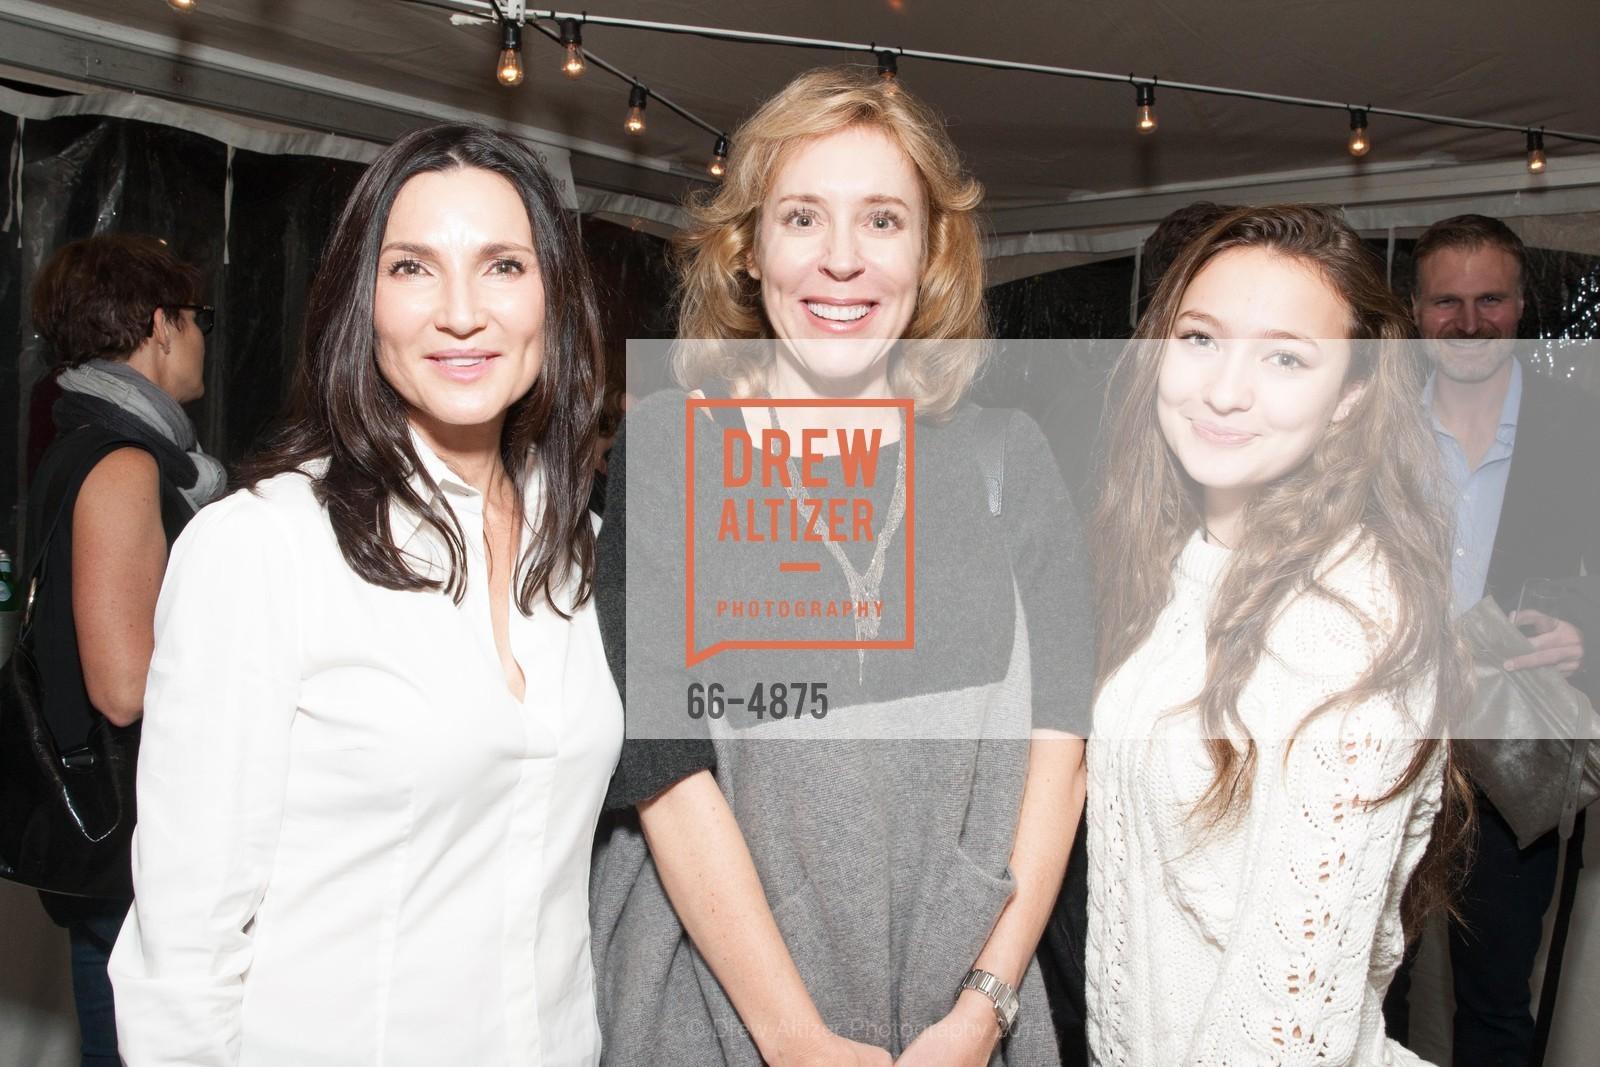 Michelle Battelle, Nicole Haslett, Chloe Battelle, Photo #66-4875